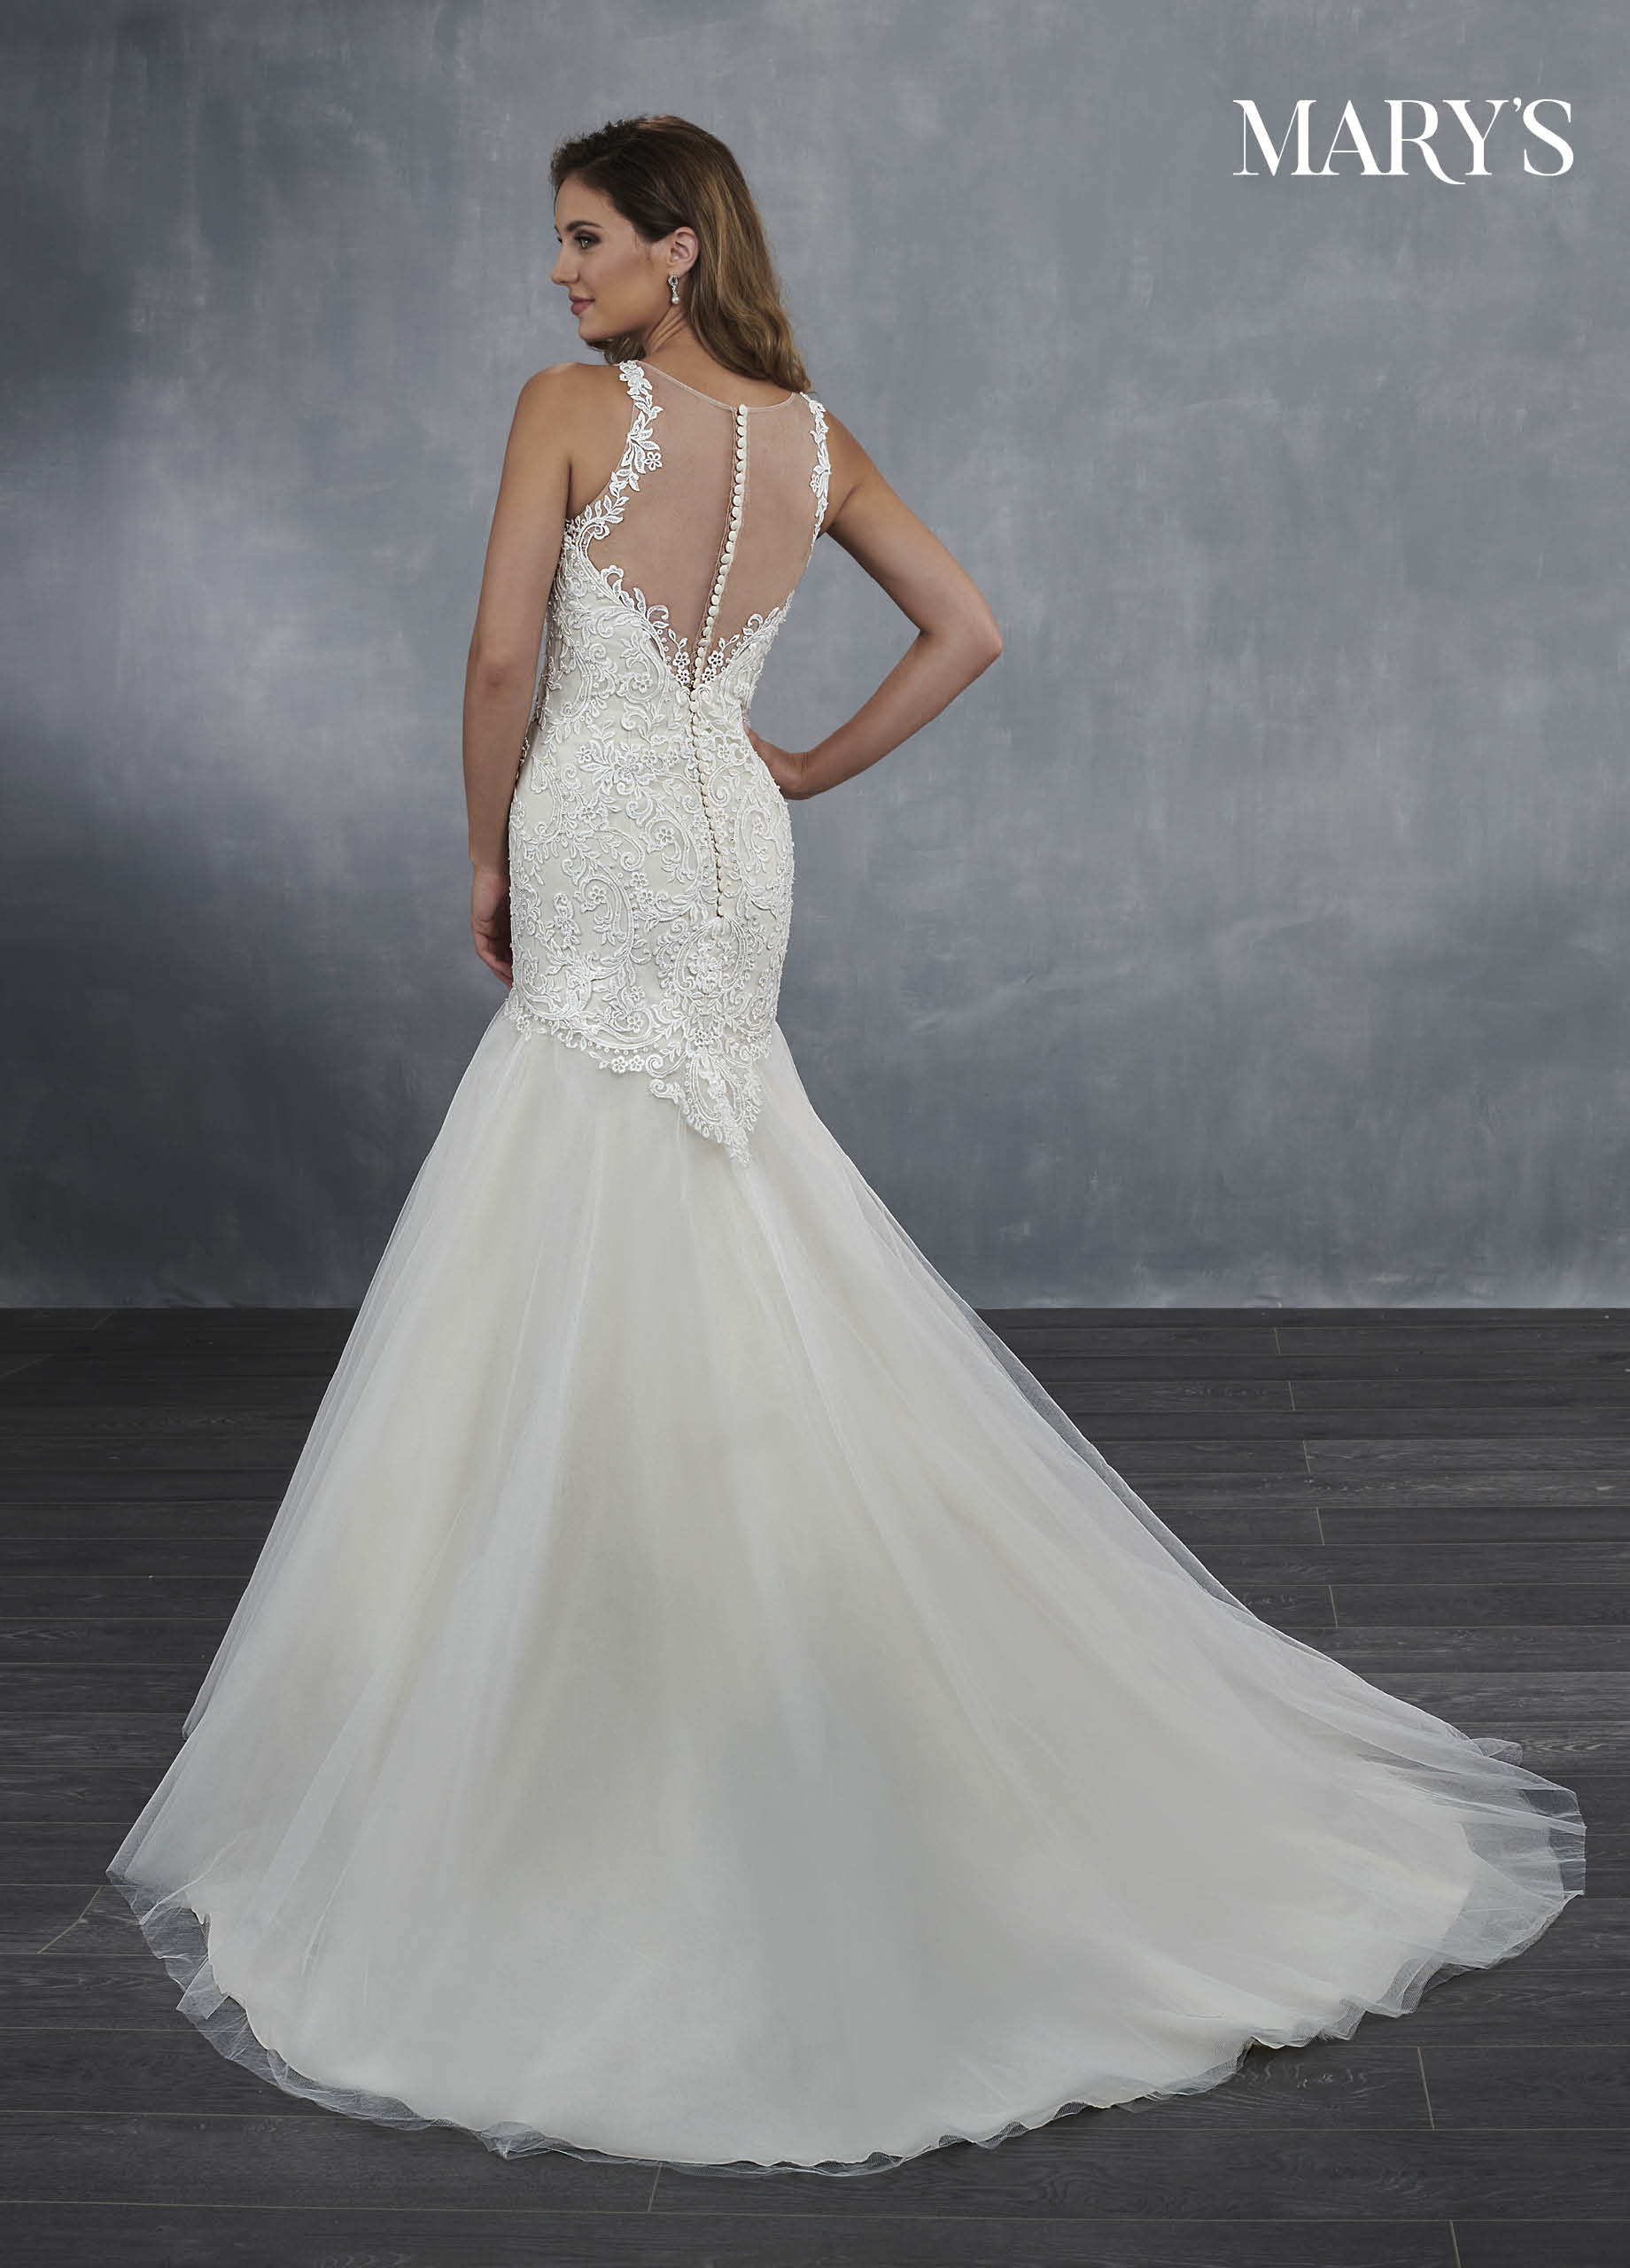 Bridal Wedding Dresses | Mary's | Style - MB3058